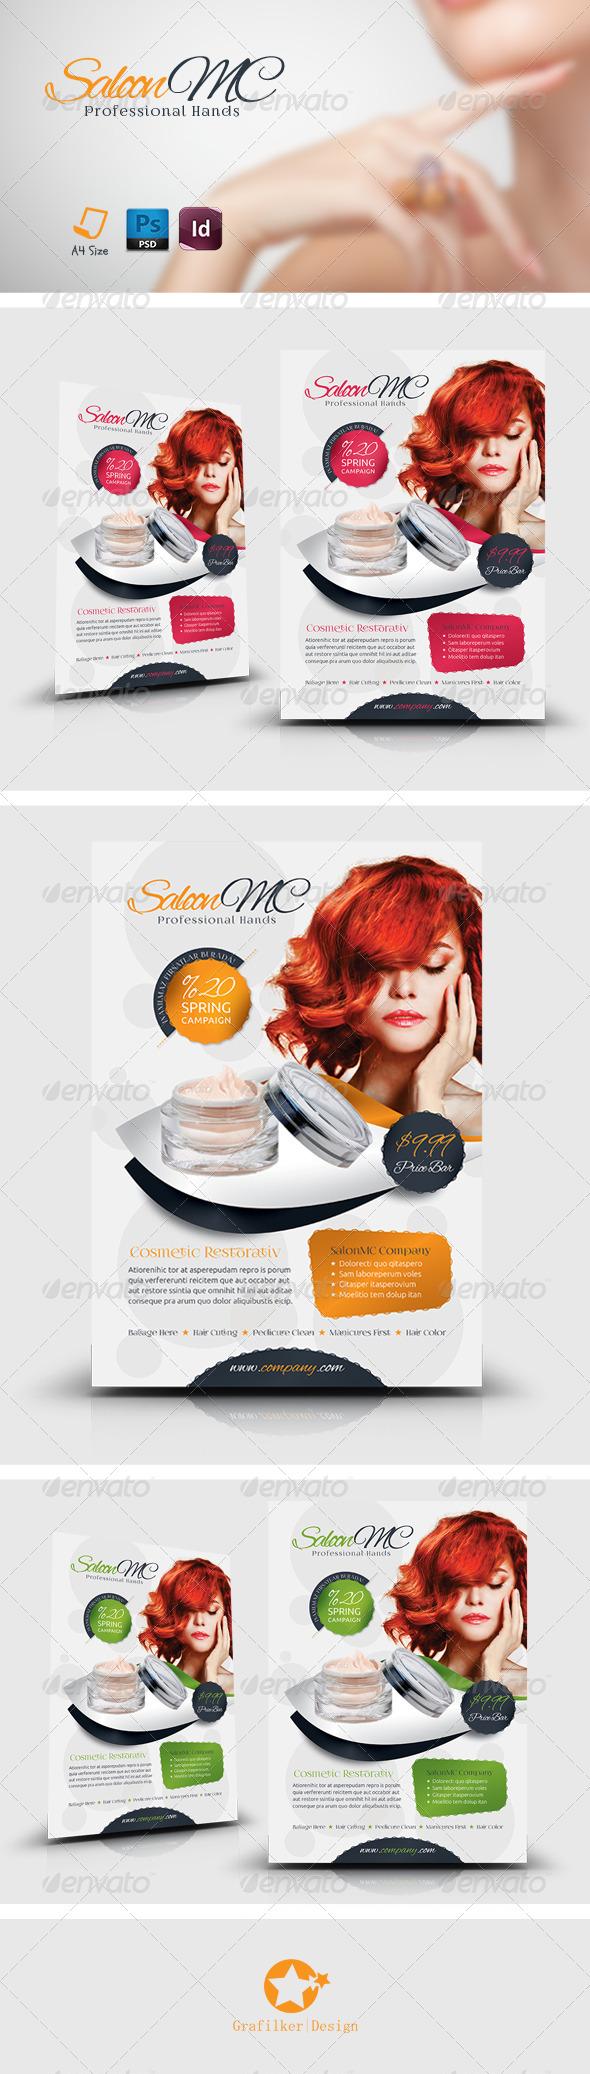 GraphicRiver Beauty Salon Flyer Templates 7809124